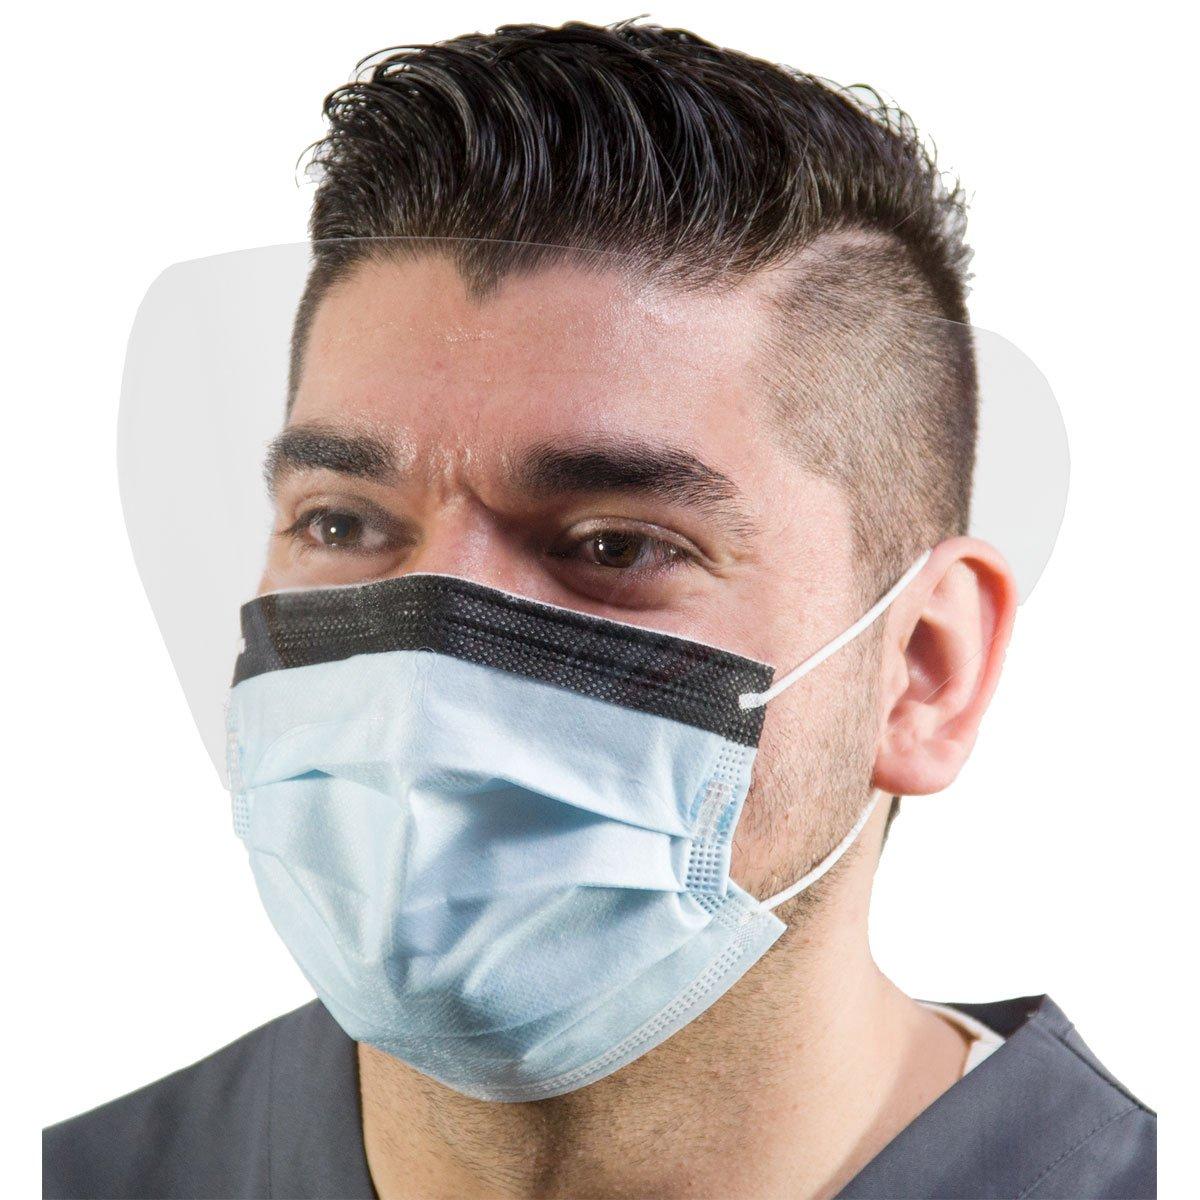 Disposable Procedure Face Mask Eye Shield Earloops Blue 120mm HG